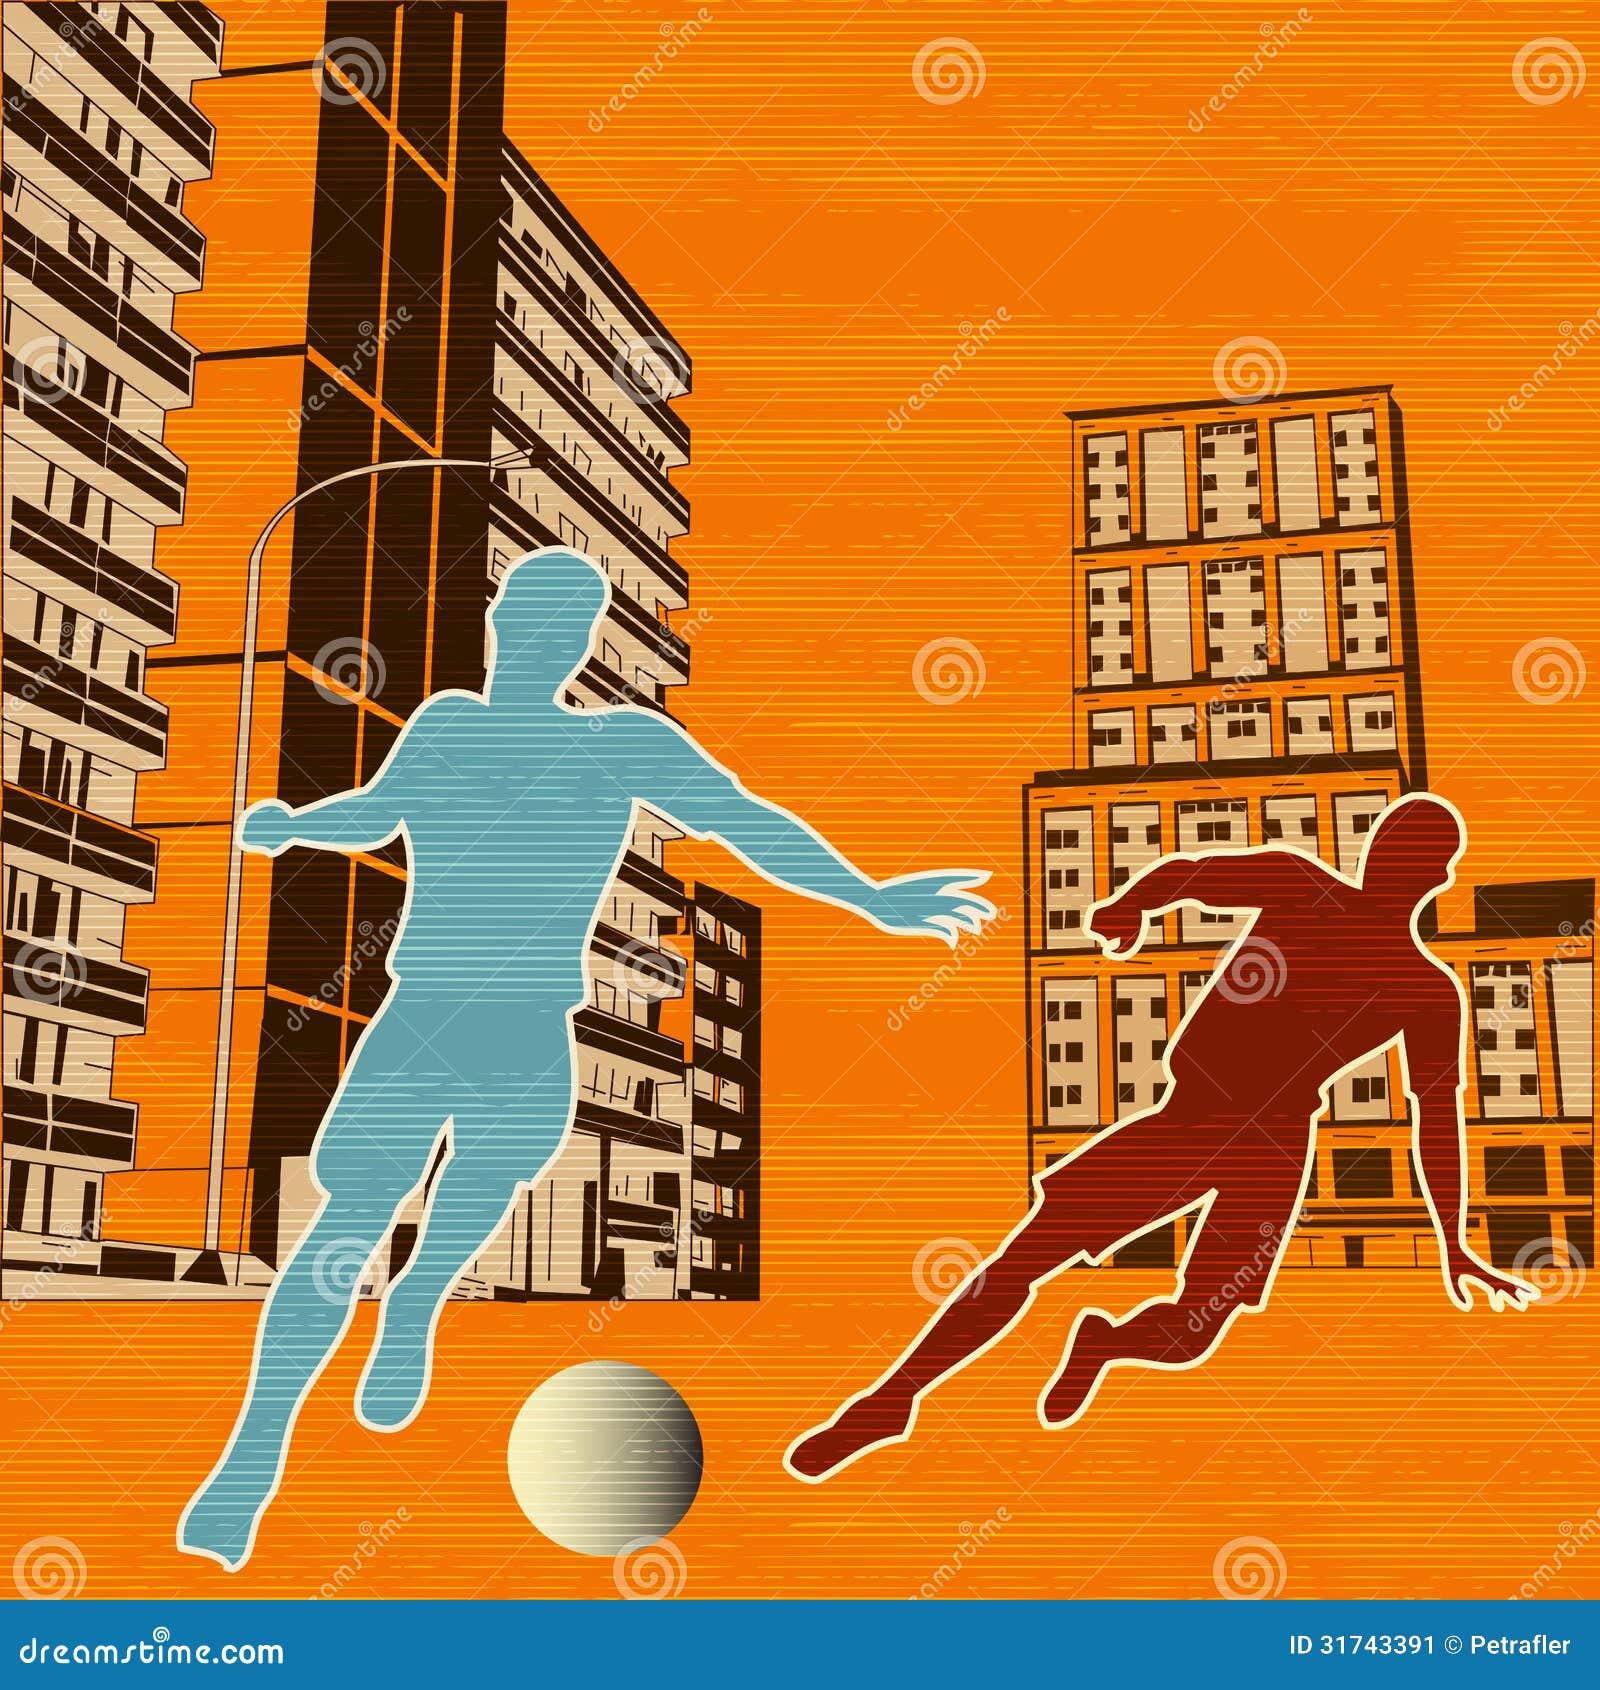 Players Club Apartments: Street Football Stock Vector. Illustration Of Metropolis